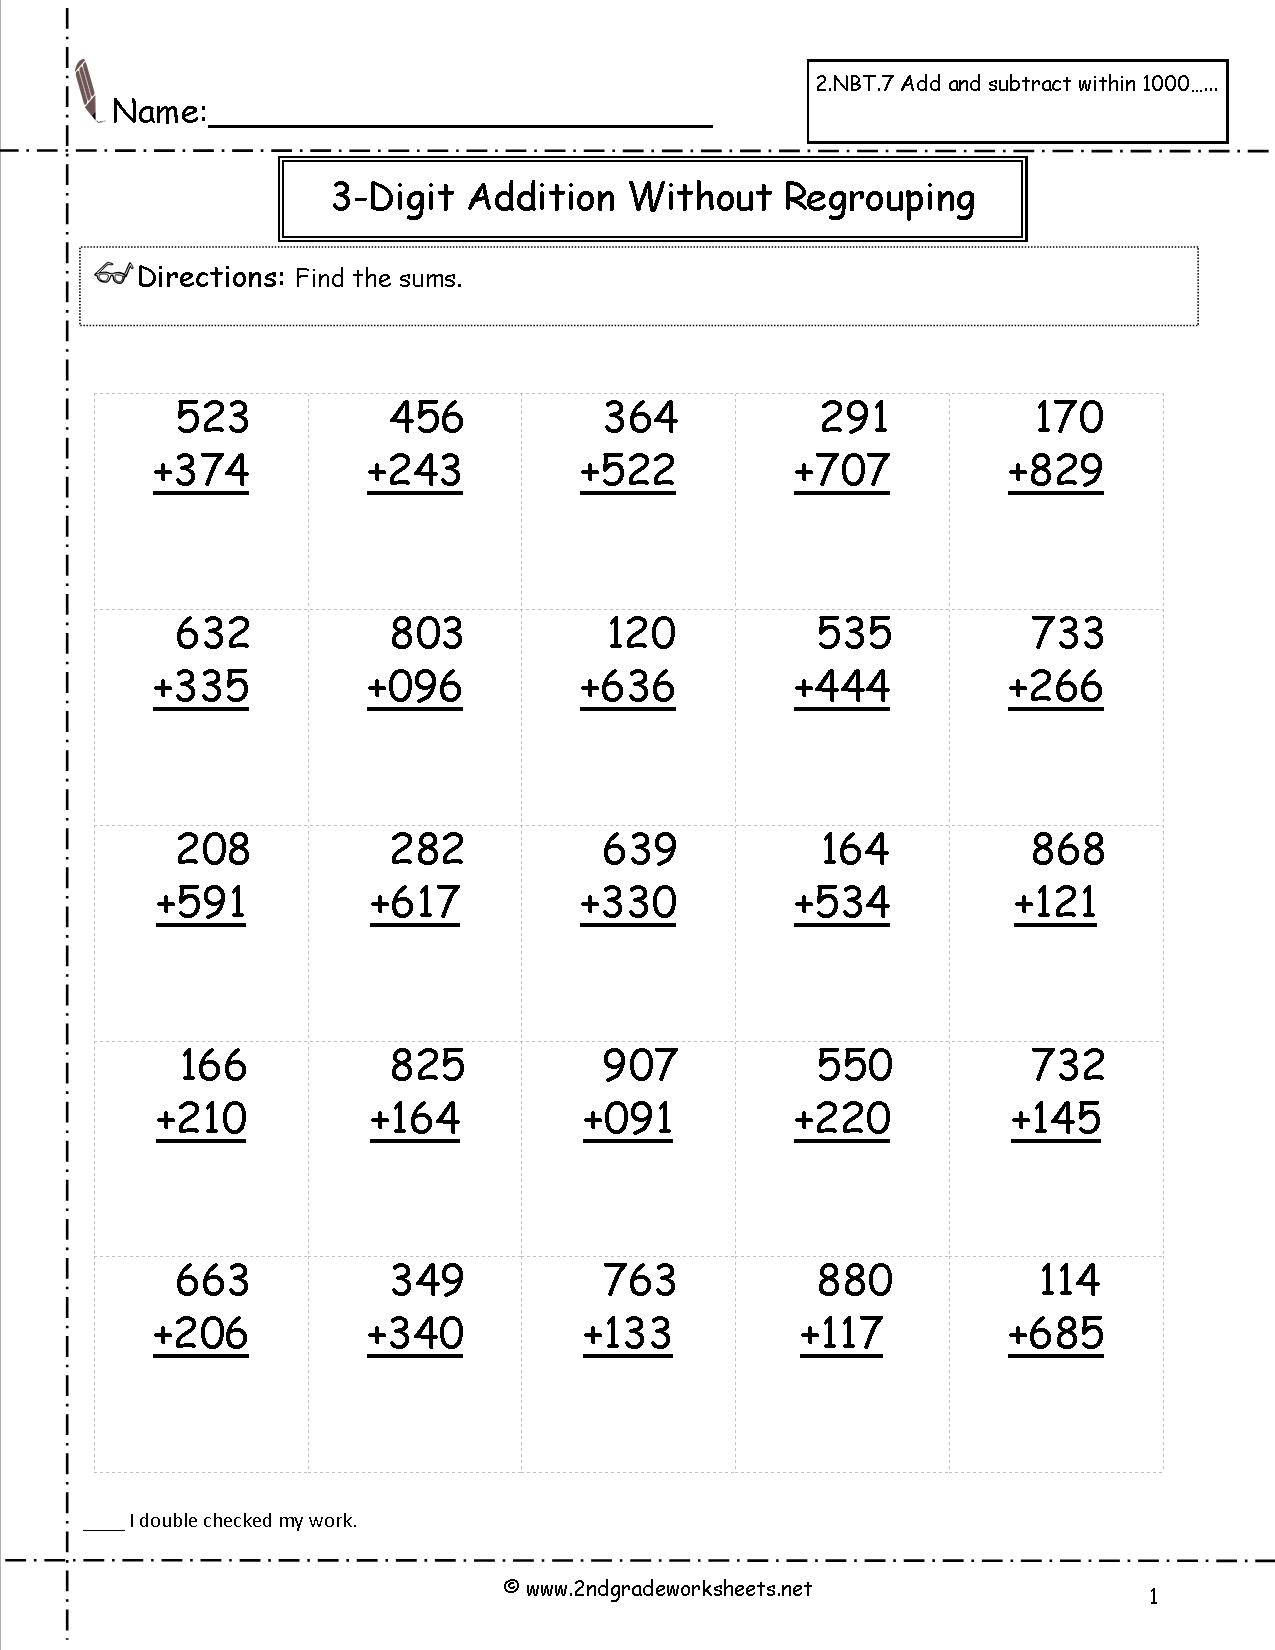 Free Math Worksheets And Printouts - Free Printable Second Grade Math Worksheets